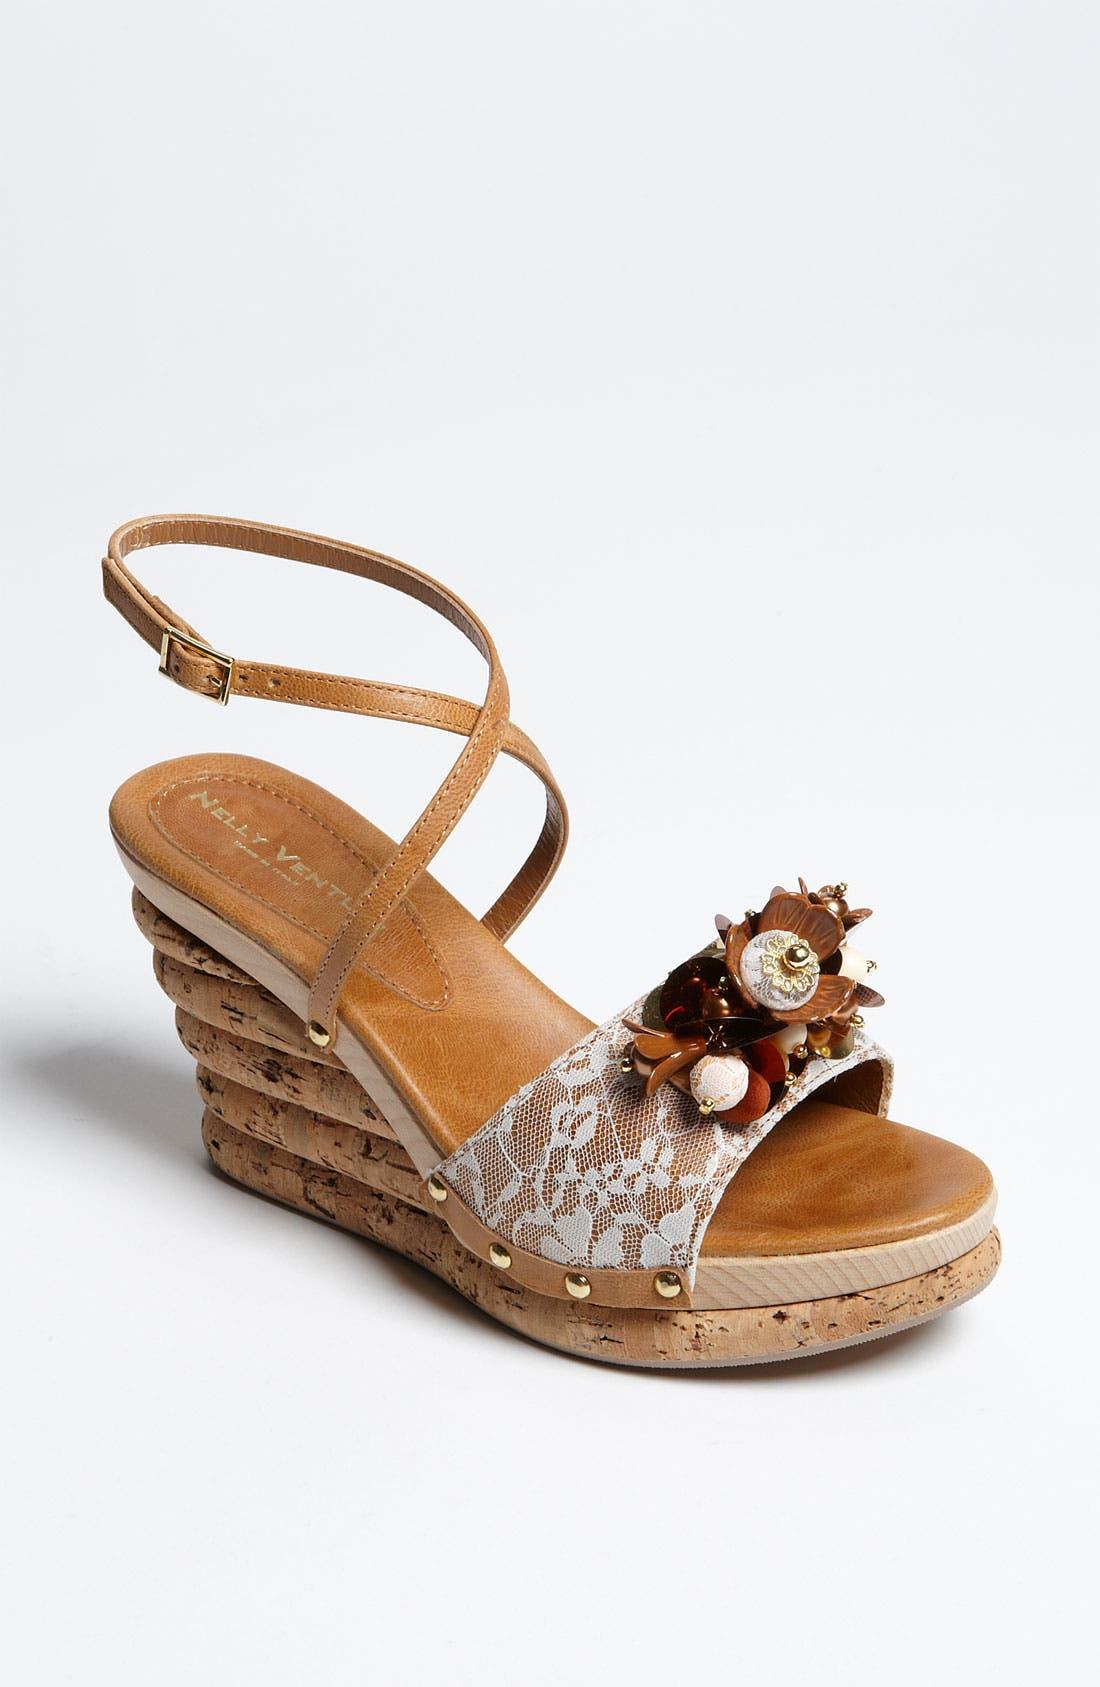 Main Image - Nelly Venturi '305 Mod' Sandal